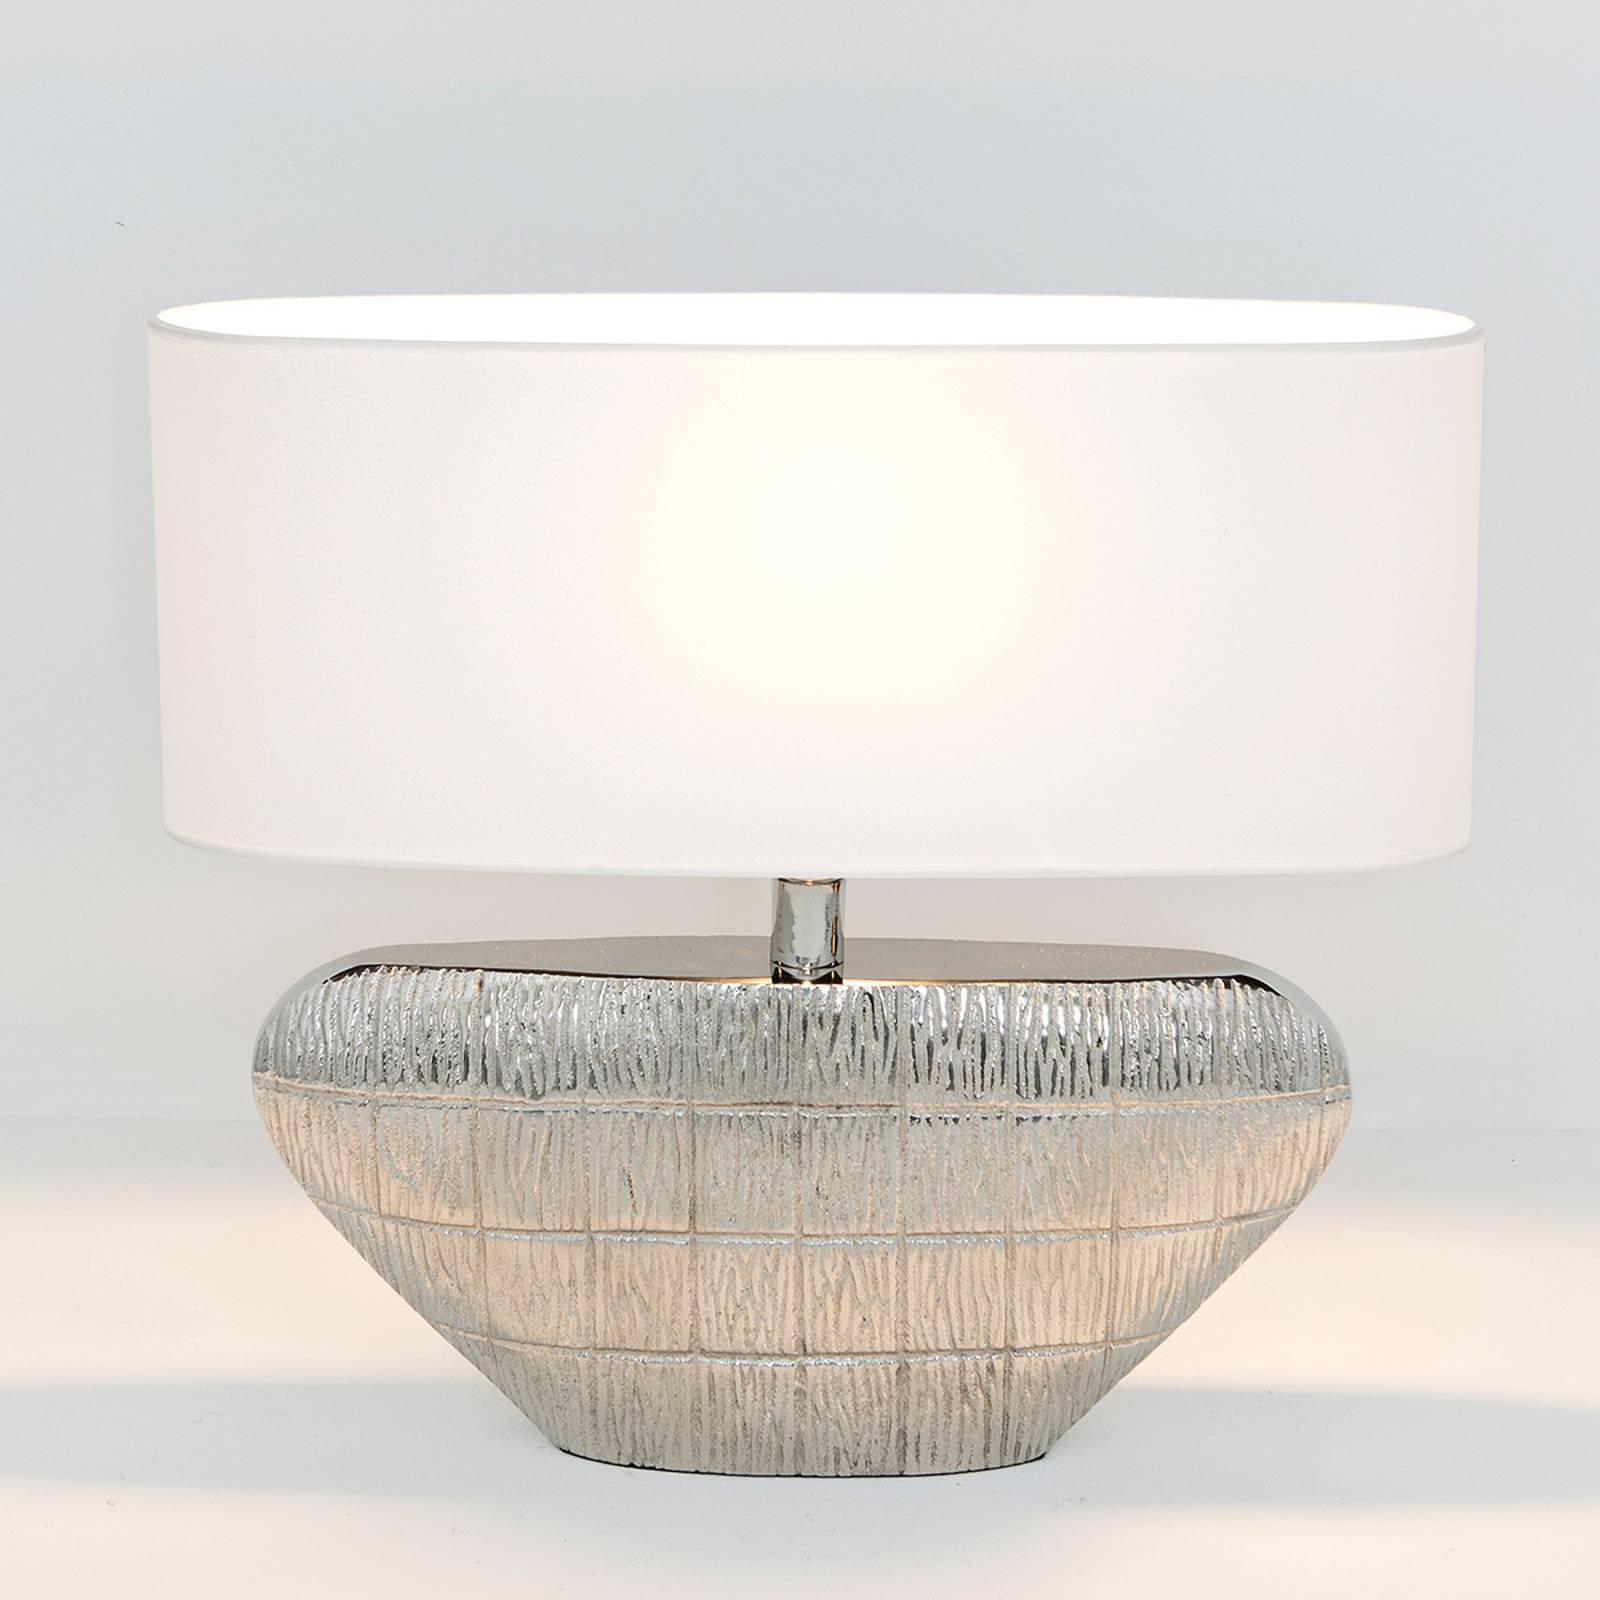 Cleopatra - oval bordlampe med tekstilskjerm